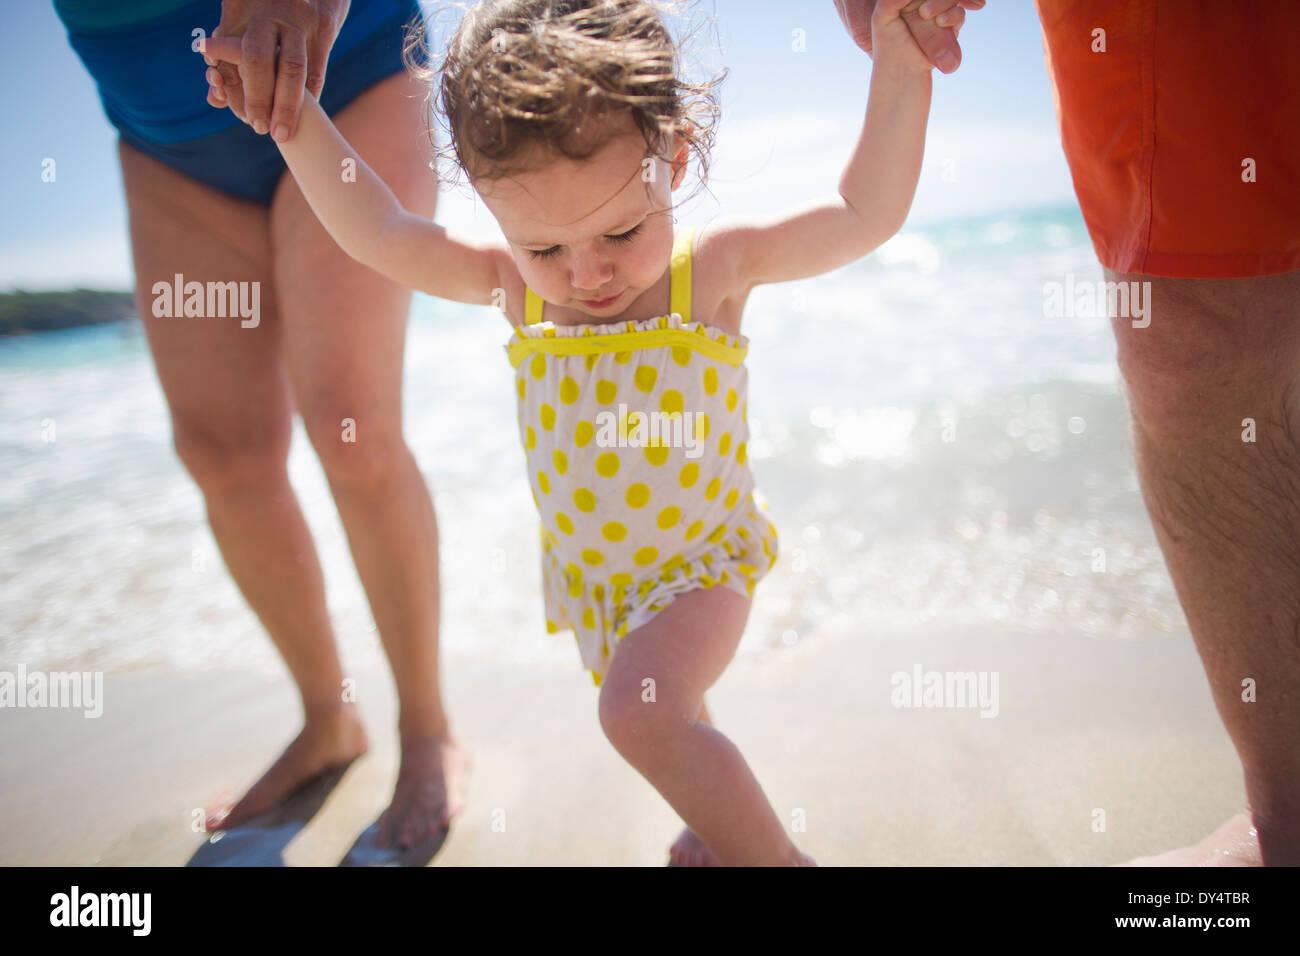 Tout-petits et grands-parents holding hands, walking on beach Photo Stock